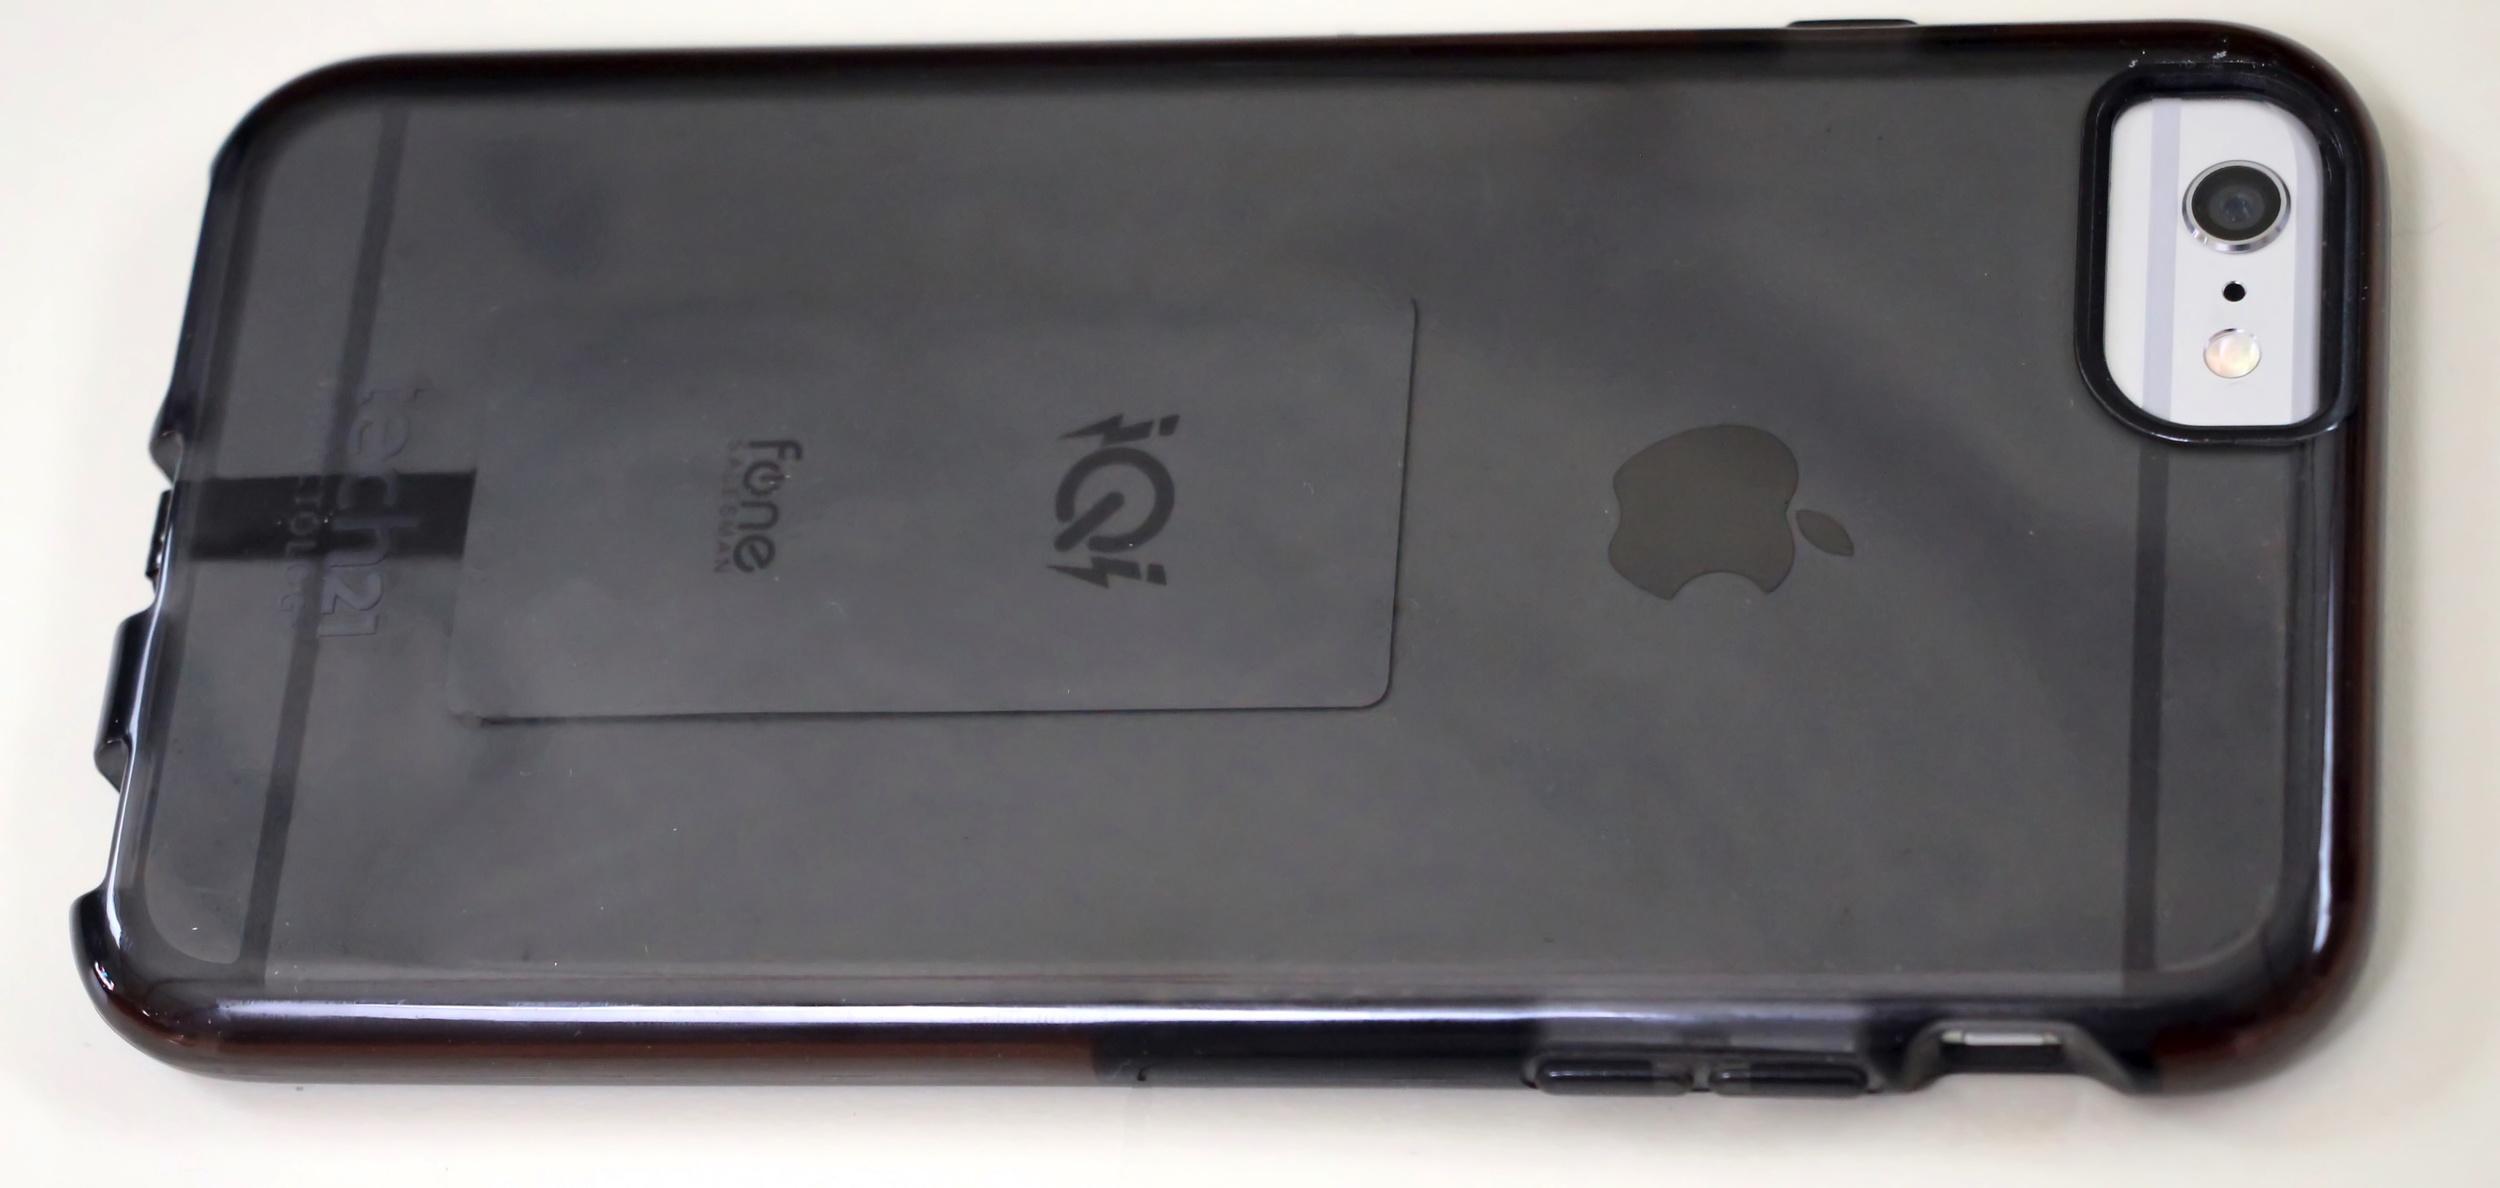 iQi Mobile Qi Receiver inside iPhone 6 Plus case. Photo ©2015 Steven Sande